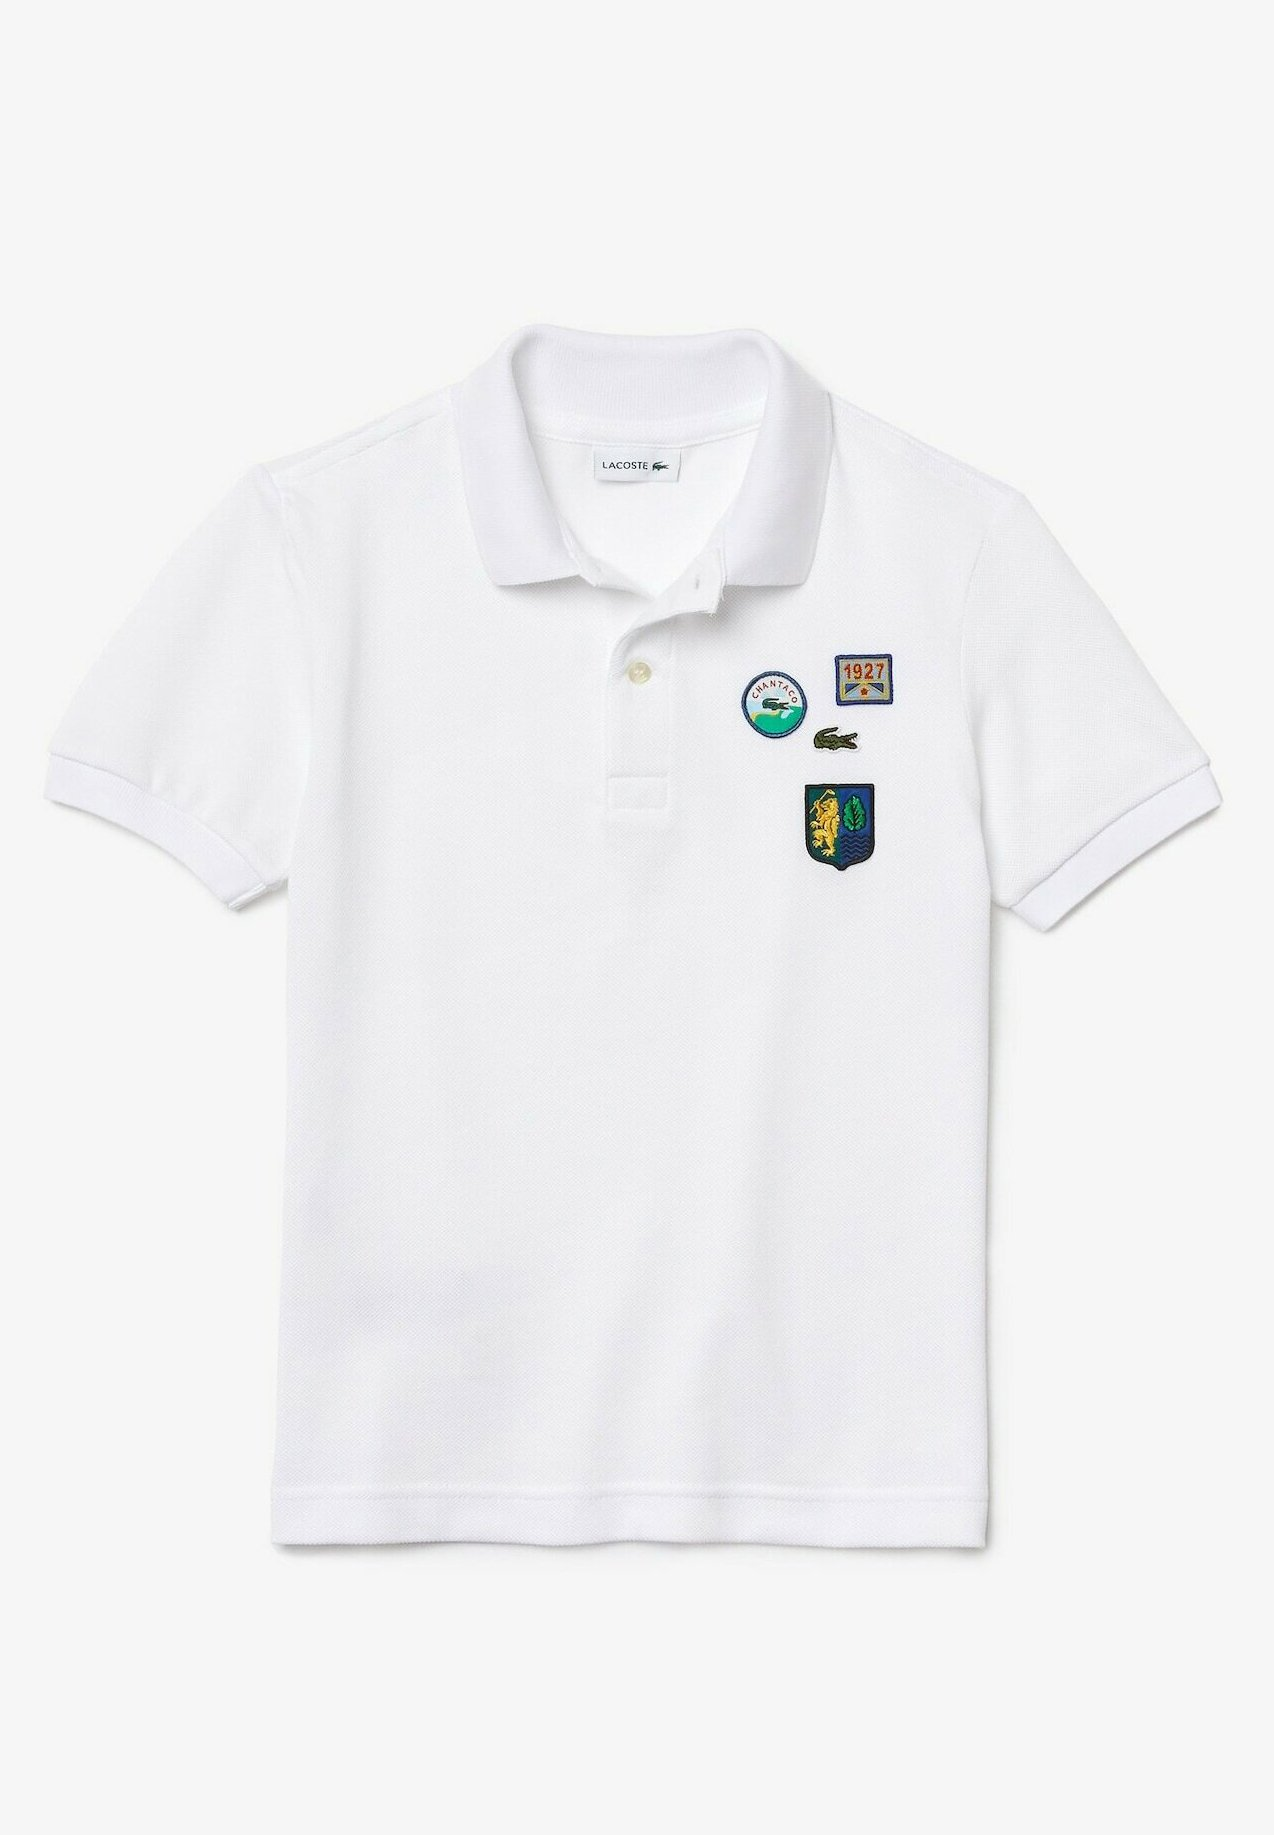 Kinder Poloshirt - weiß